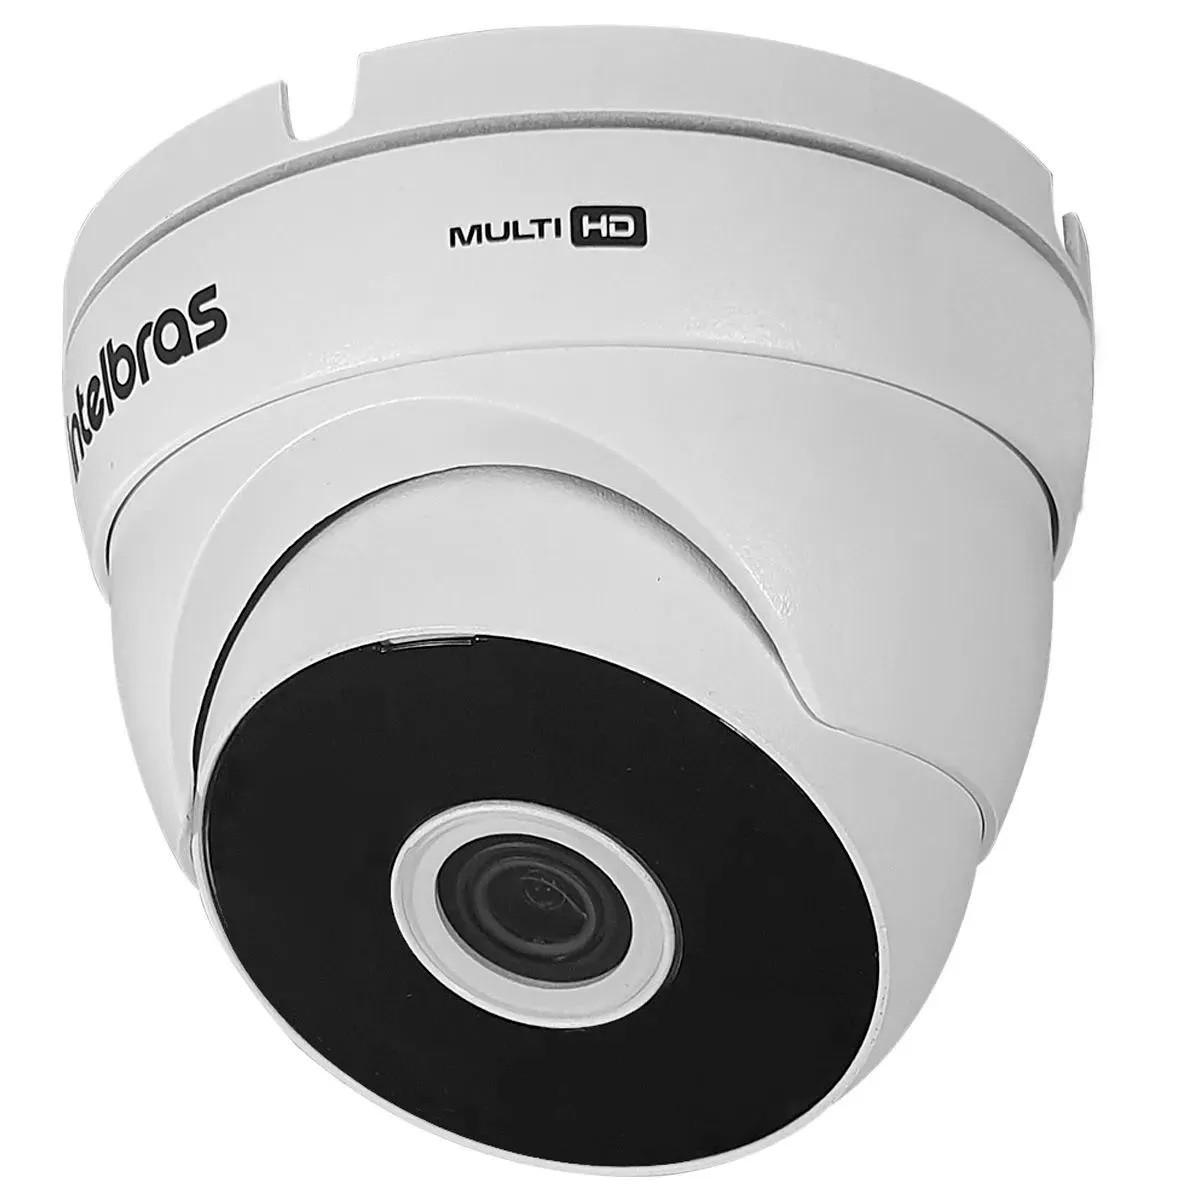 Câmera de Segurança Intelbras VHD 3220 D G6 Dome Full HD 1080p